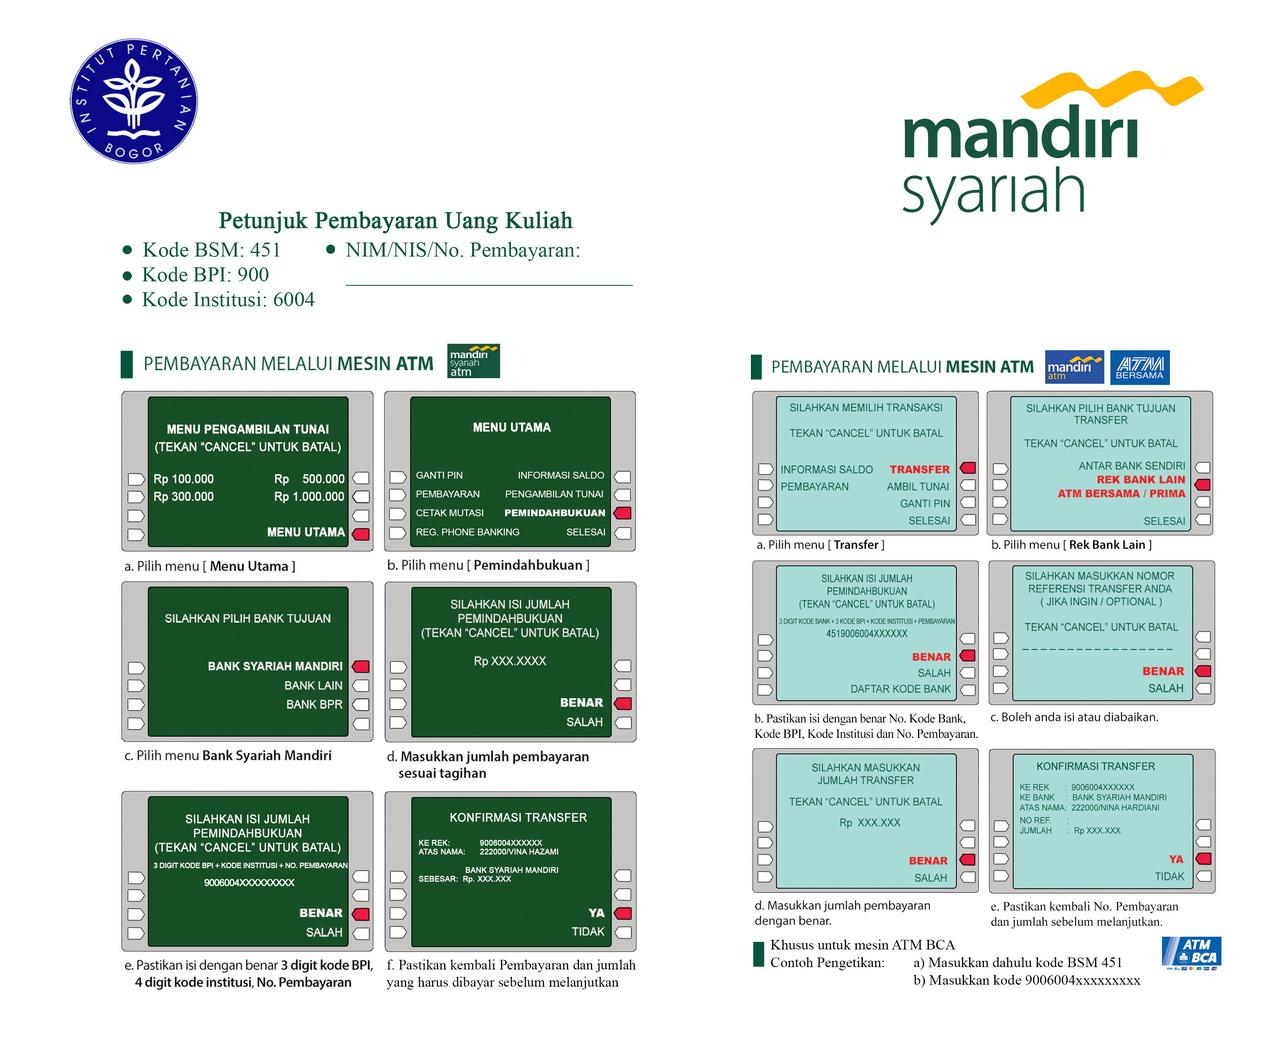 Cara Bayar Ukt Ipb 2018 Via Atm Mandiri Syariah Mandiri Bca Atm Bersama Kartu Bank